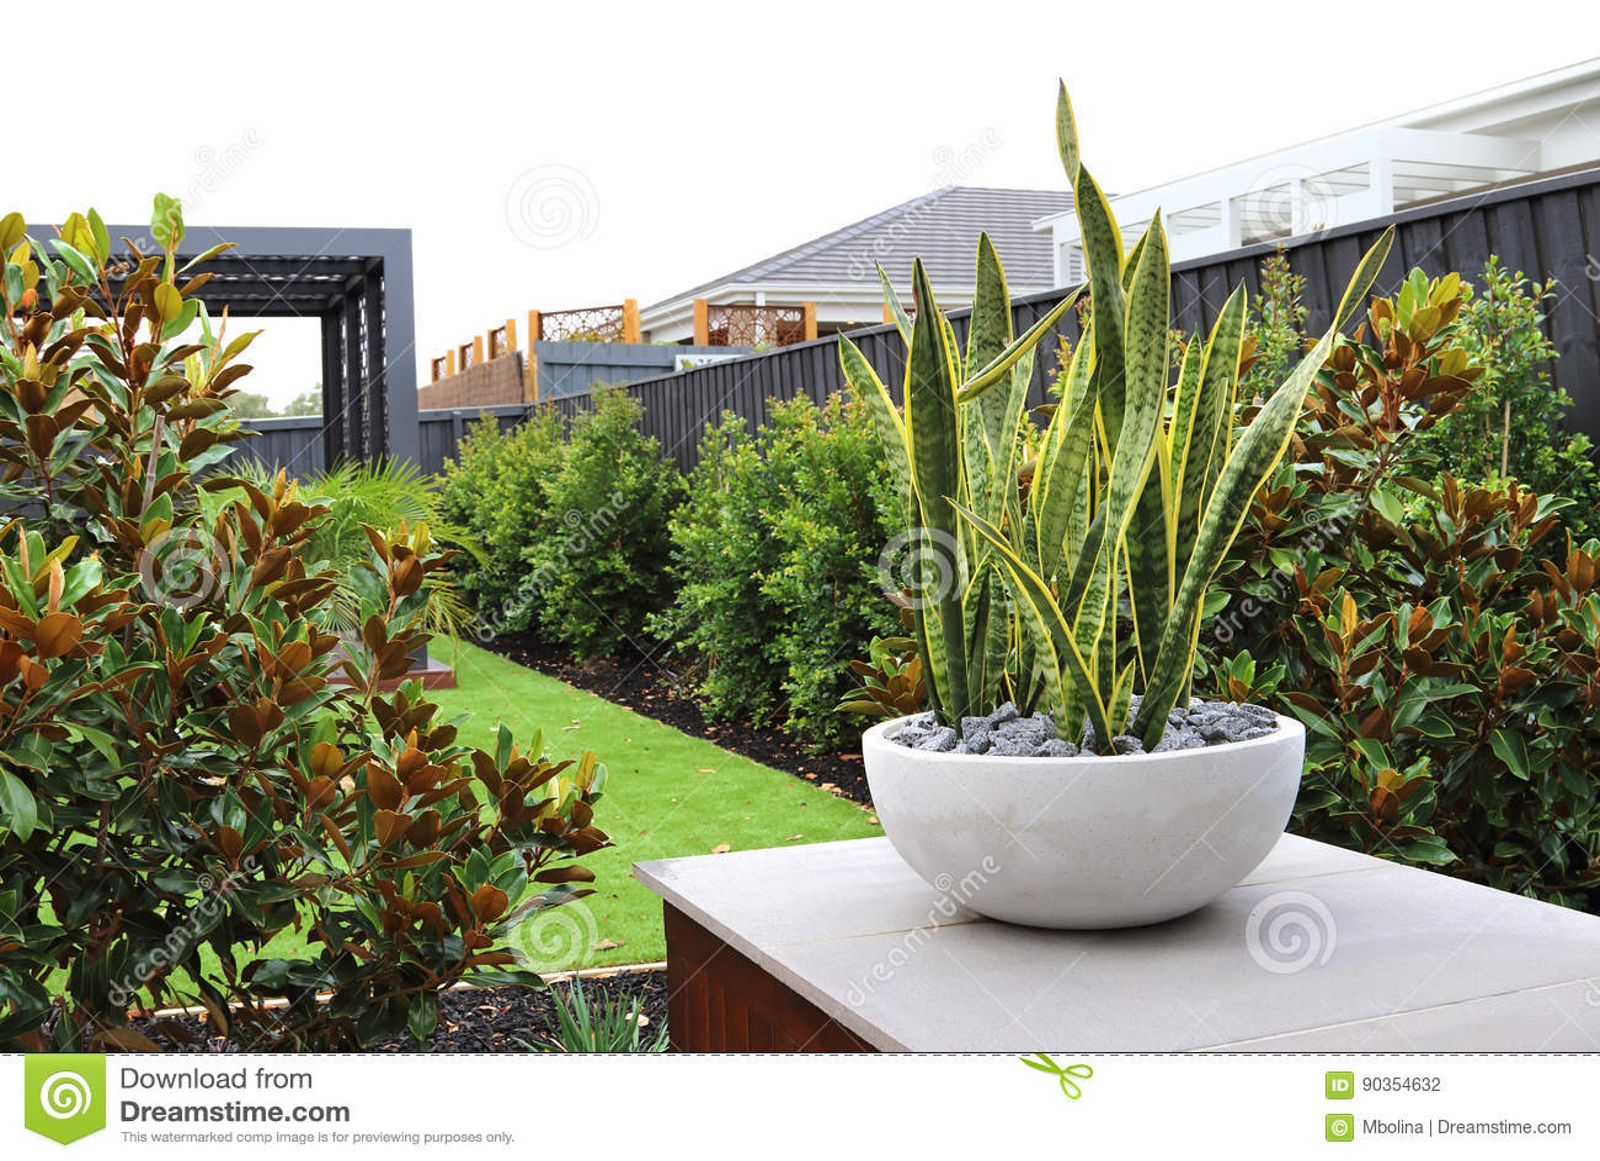 Modern Backyard Design Ideas Stock Photo Image Of Gardening